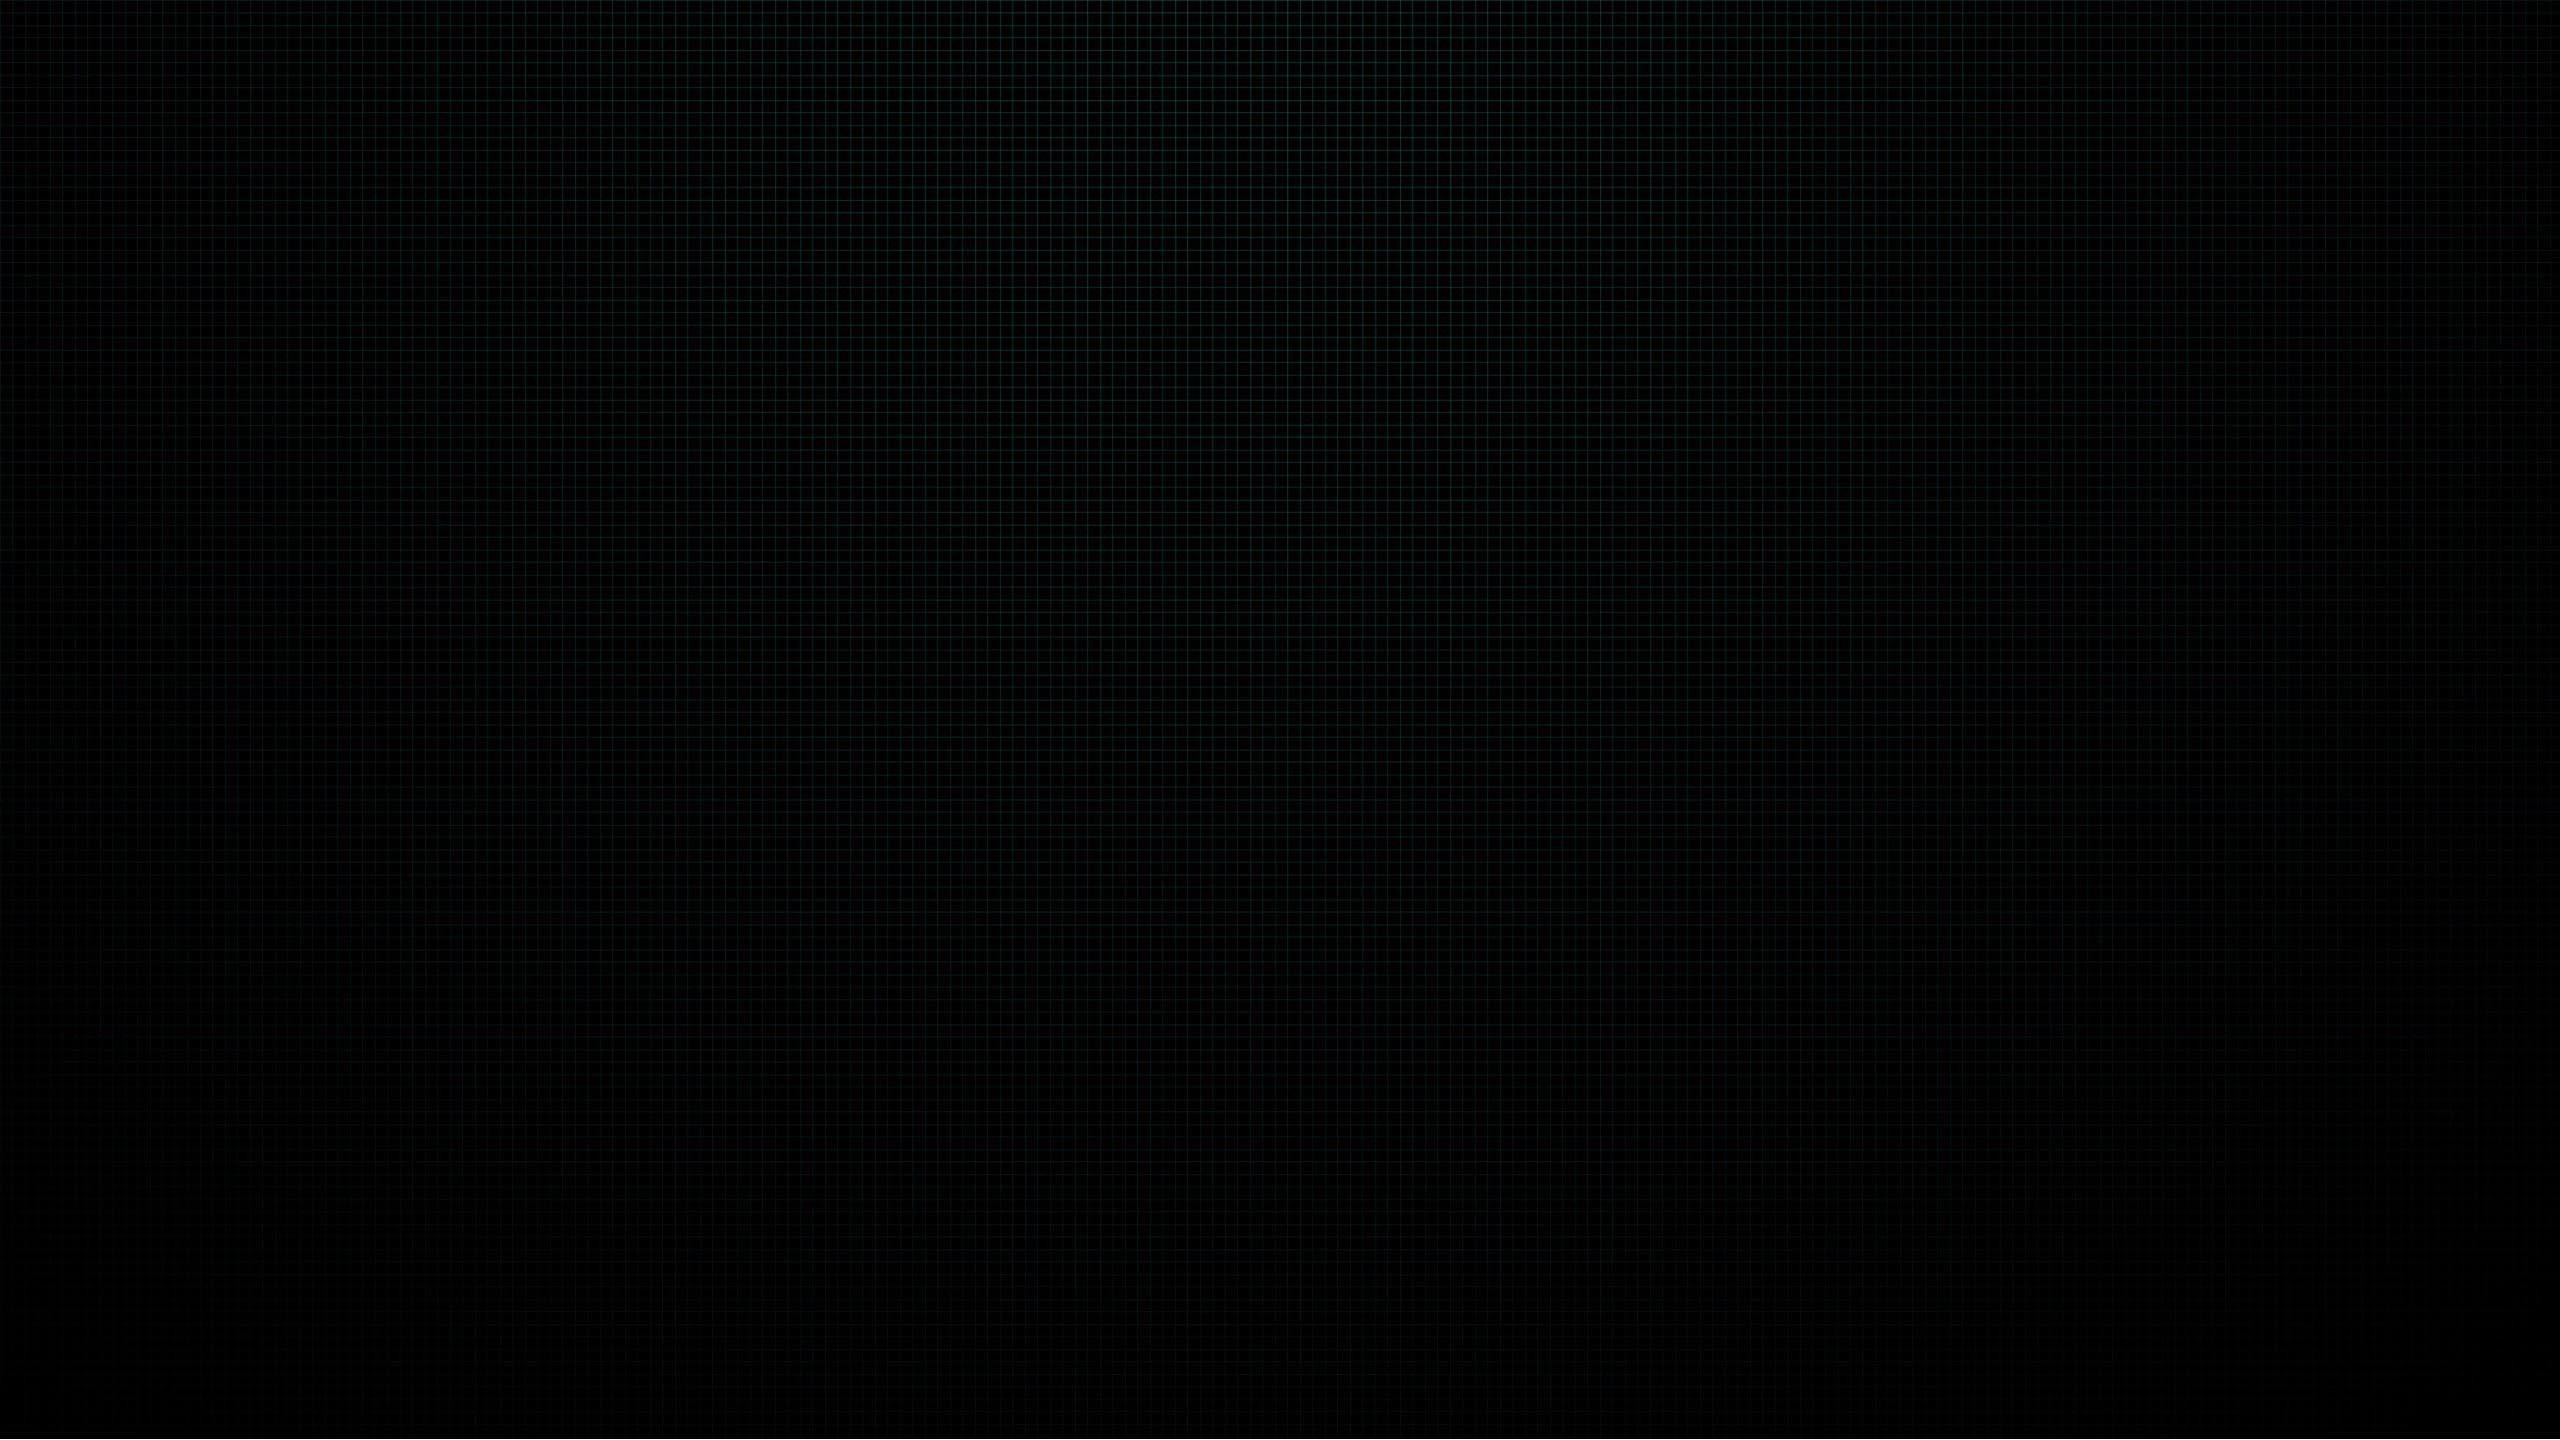 Pure Black Wallpapers - Wallpaper Cave